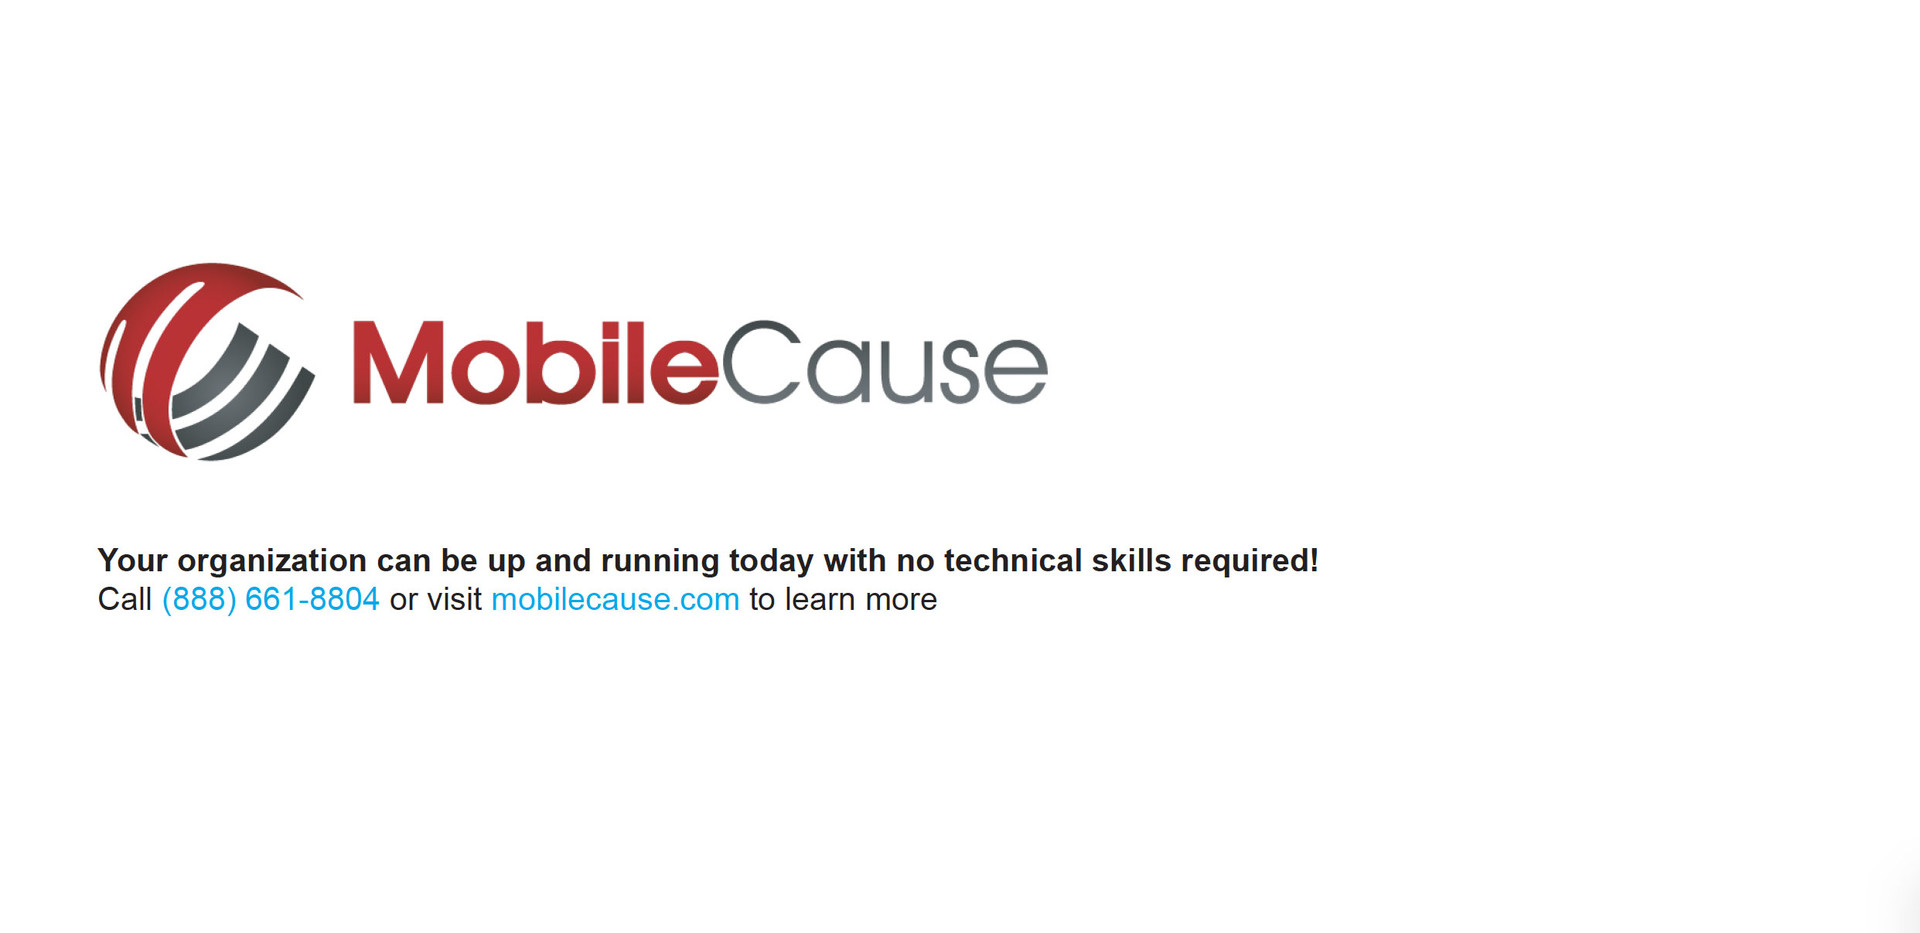 mobilecause-healthcare-19.jpg